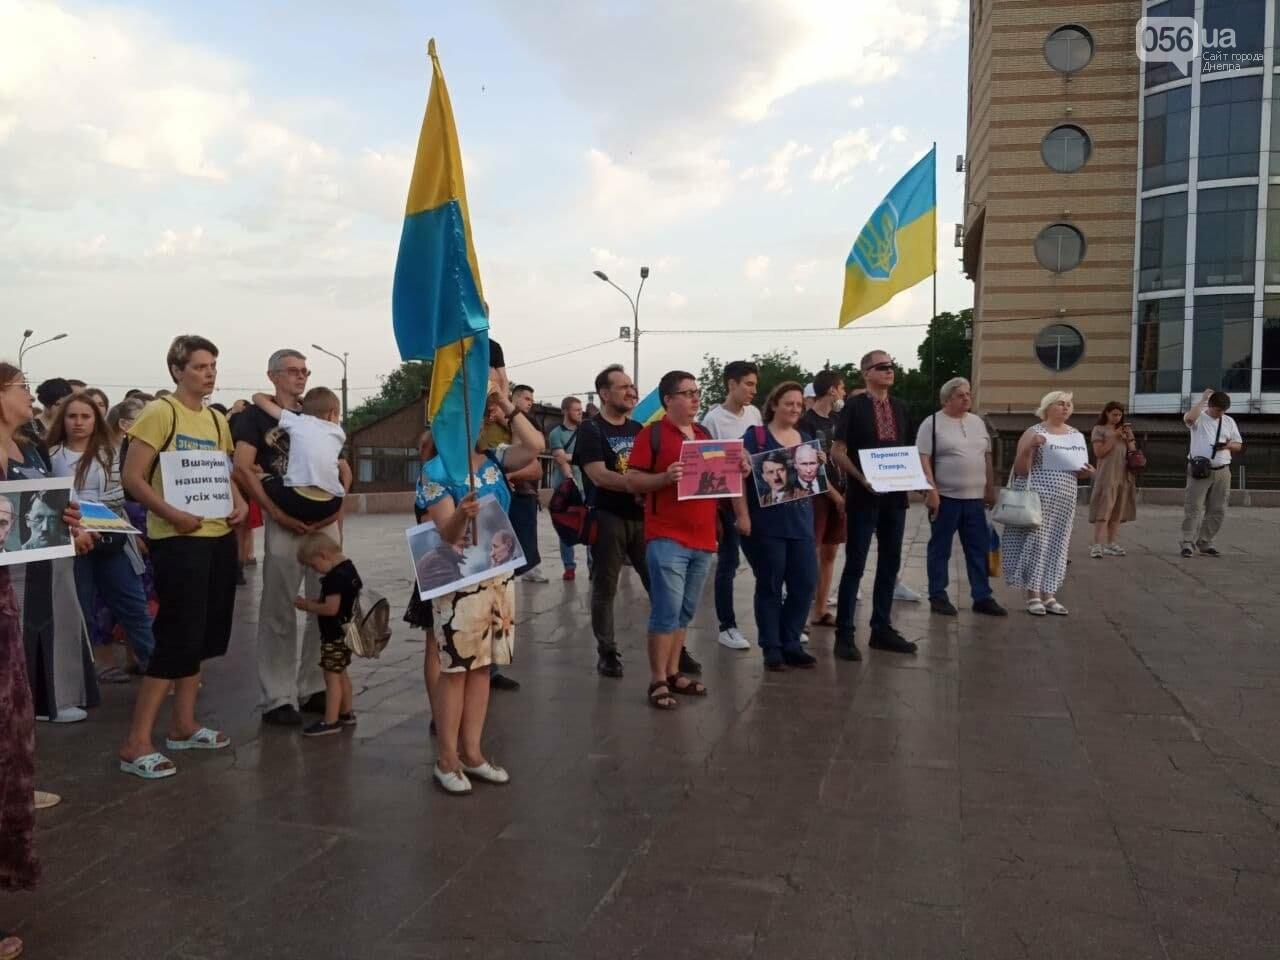 В Днепре активисты заявили, что победят Путина, - ФОТО, ВИДЕО, фото-8